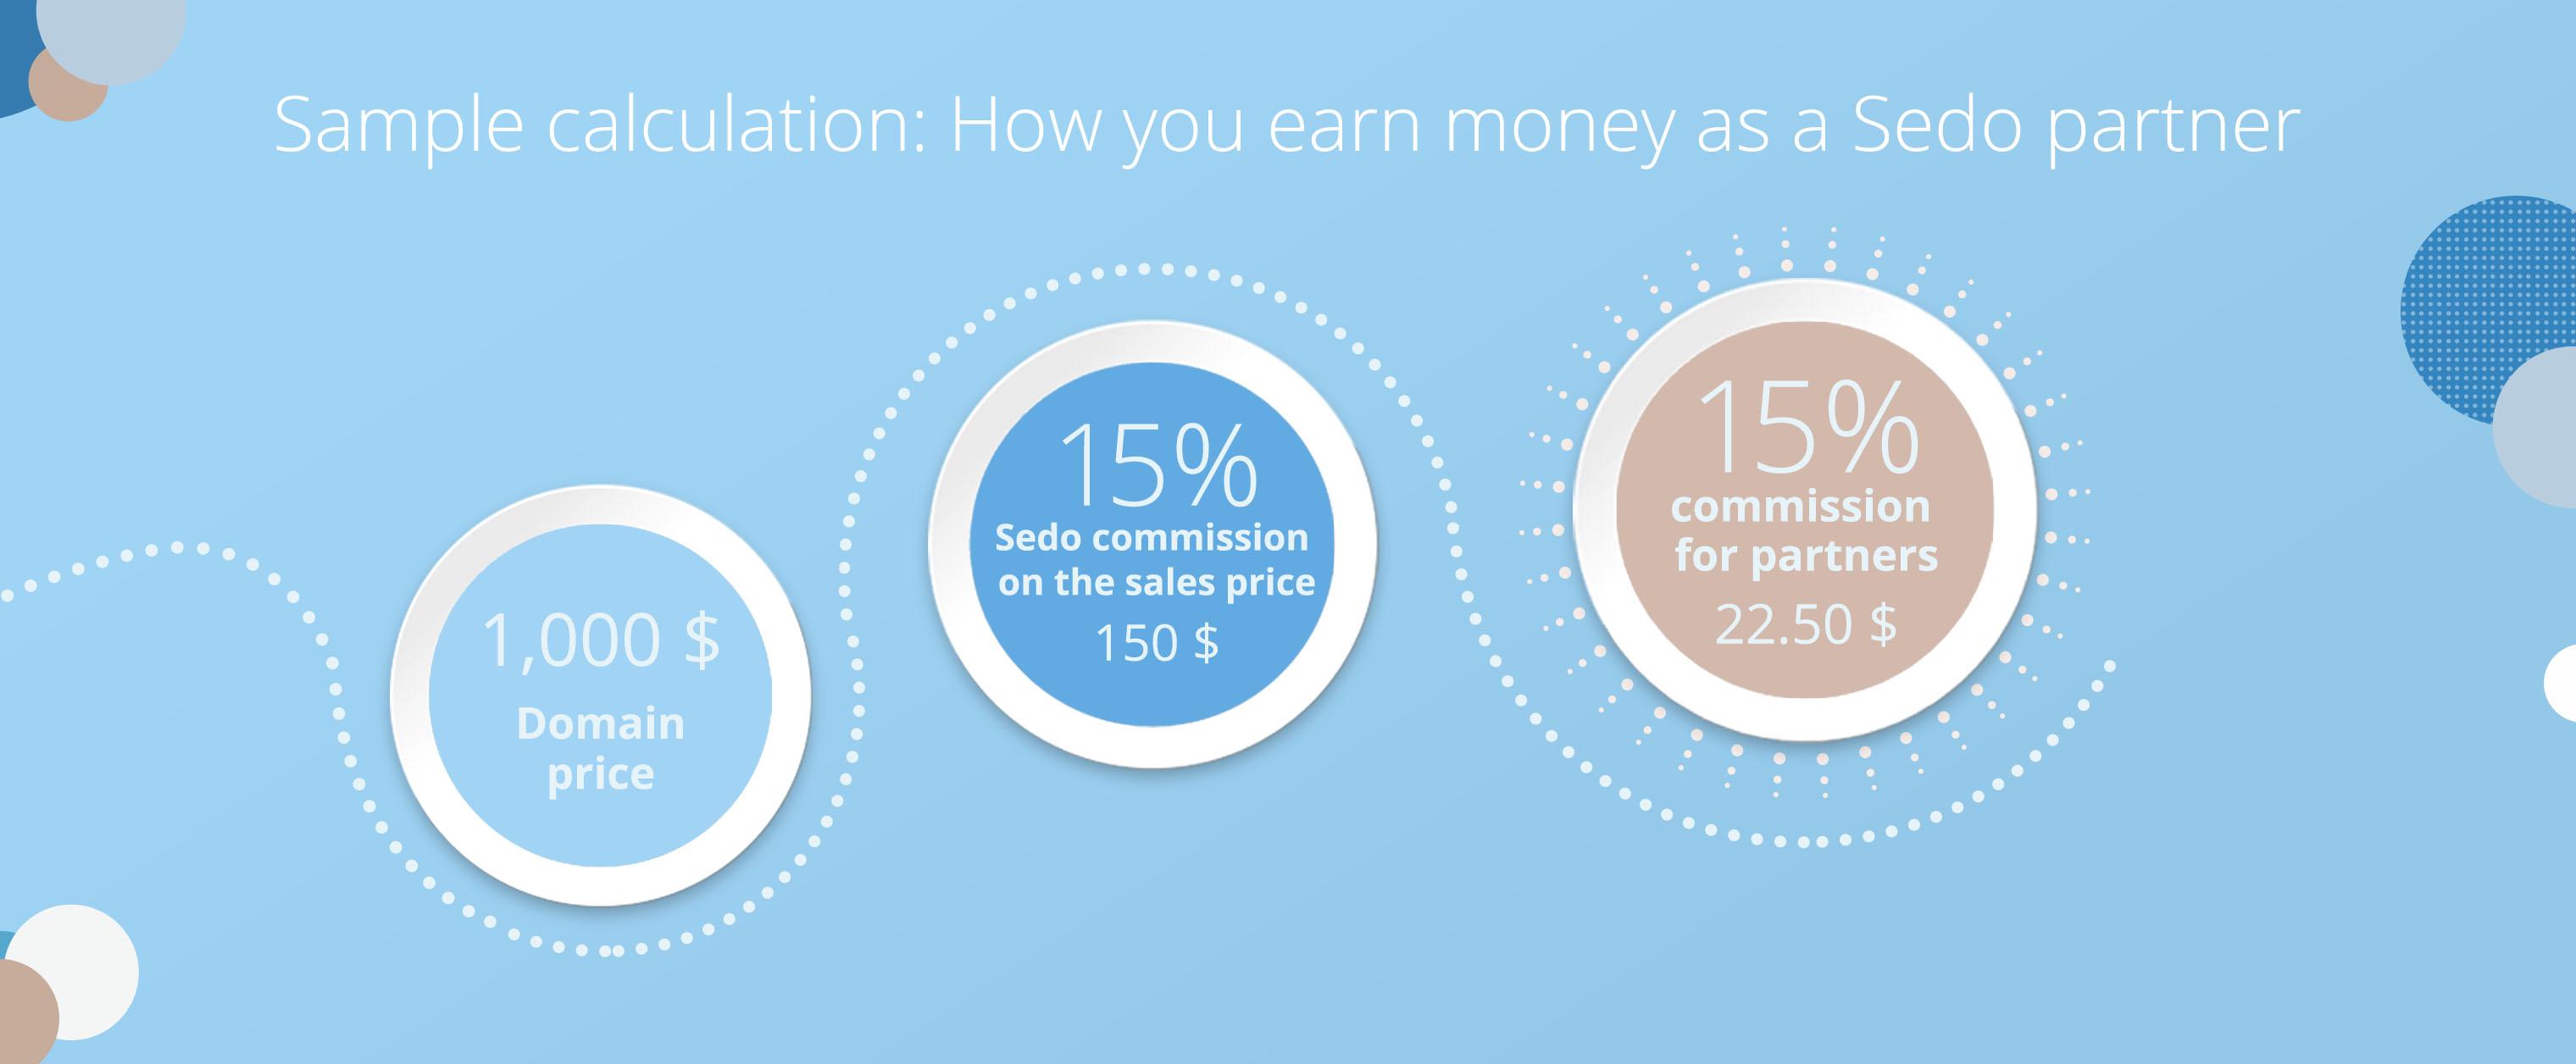 Sample calculation: Earn money as a Sedo Partner